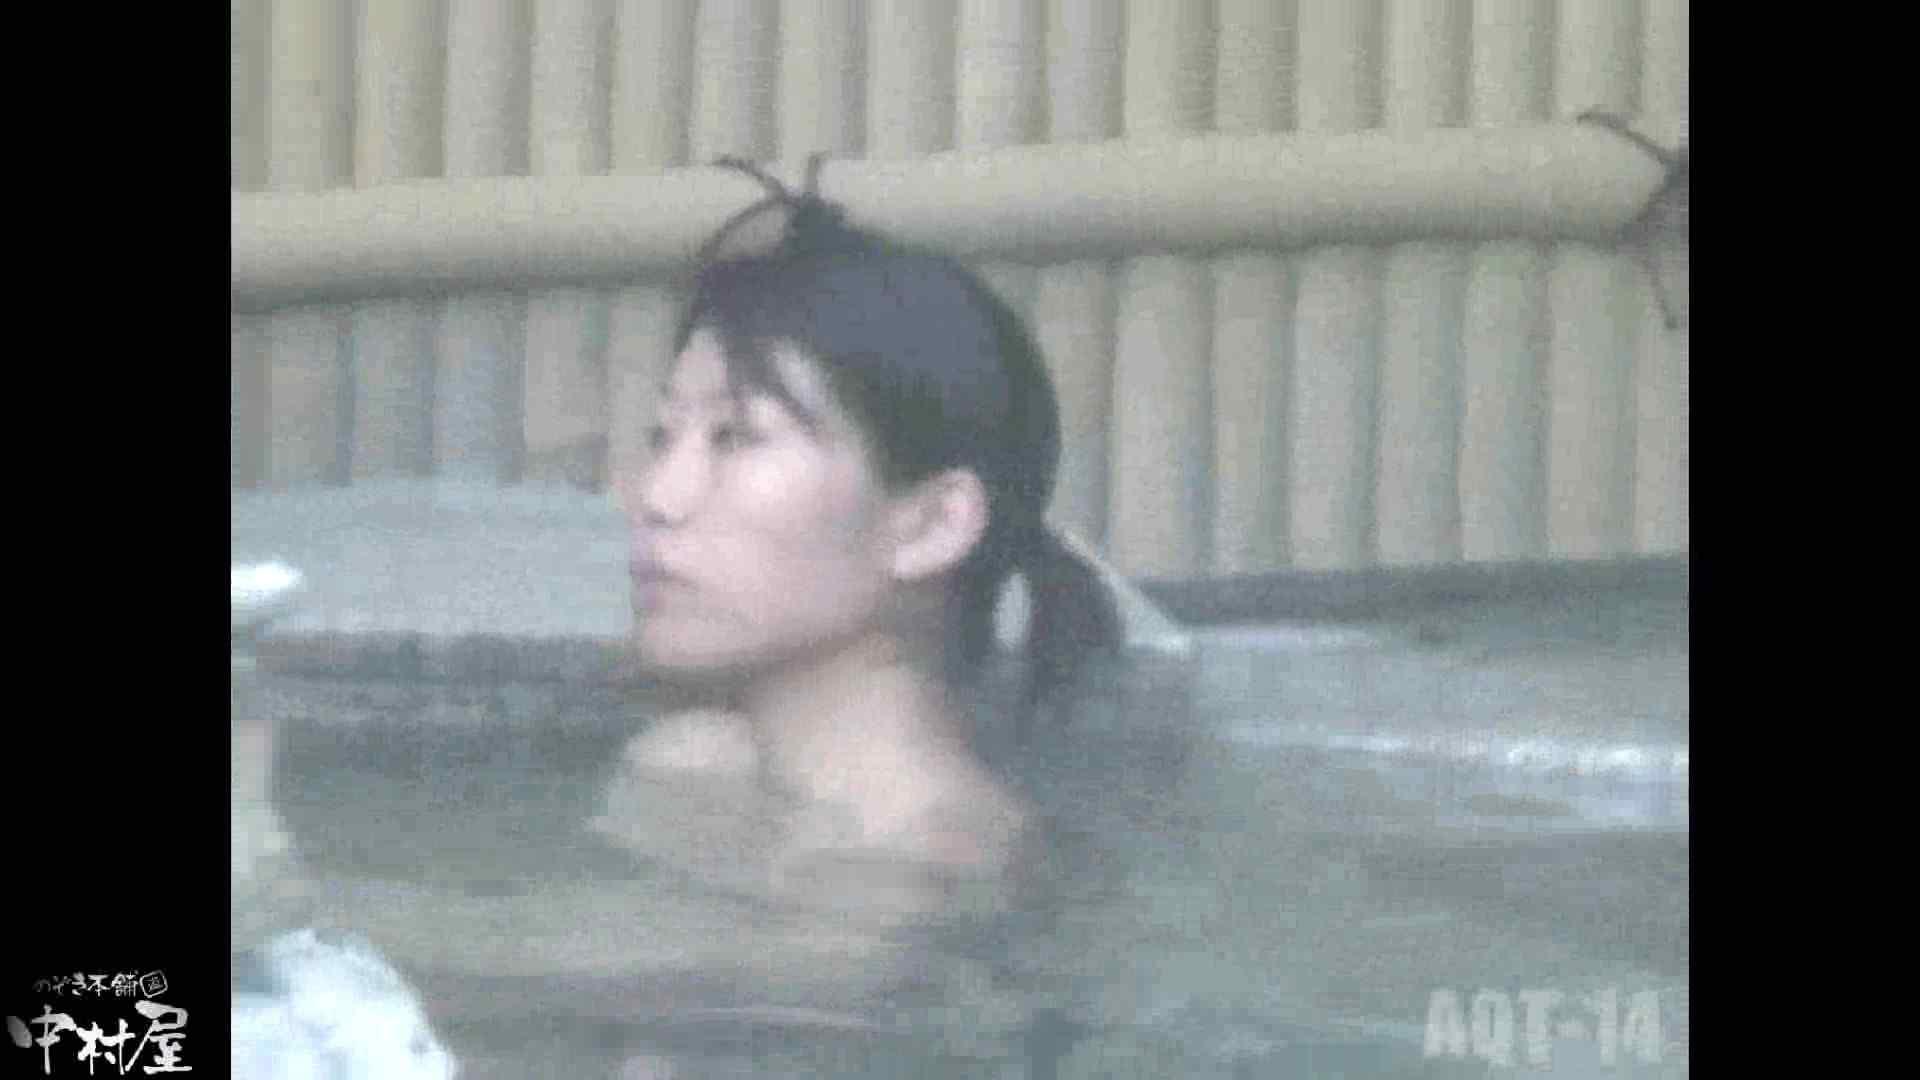 Aquaな露天風呂Vol.878潜入盗撮露天風呂十四判湯 其の一 潜入画像   露天  59画像 57